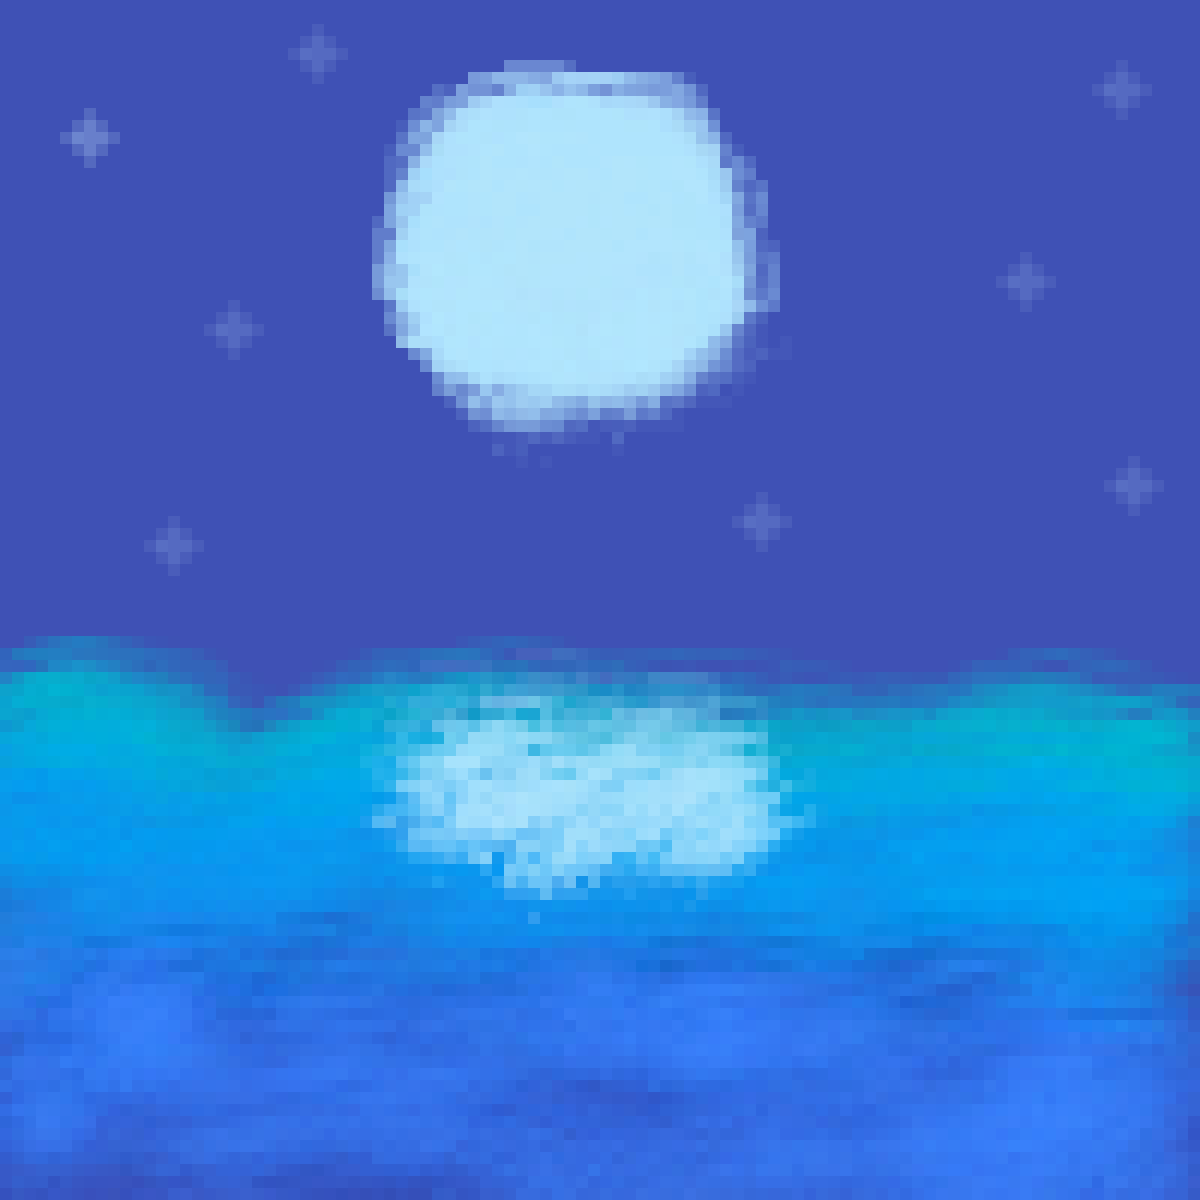 moon over ocean by lexymaster